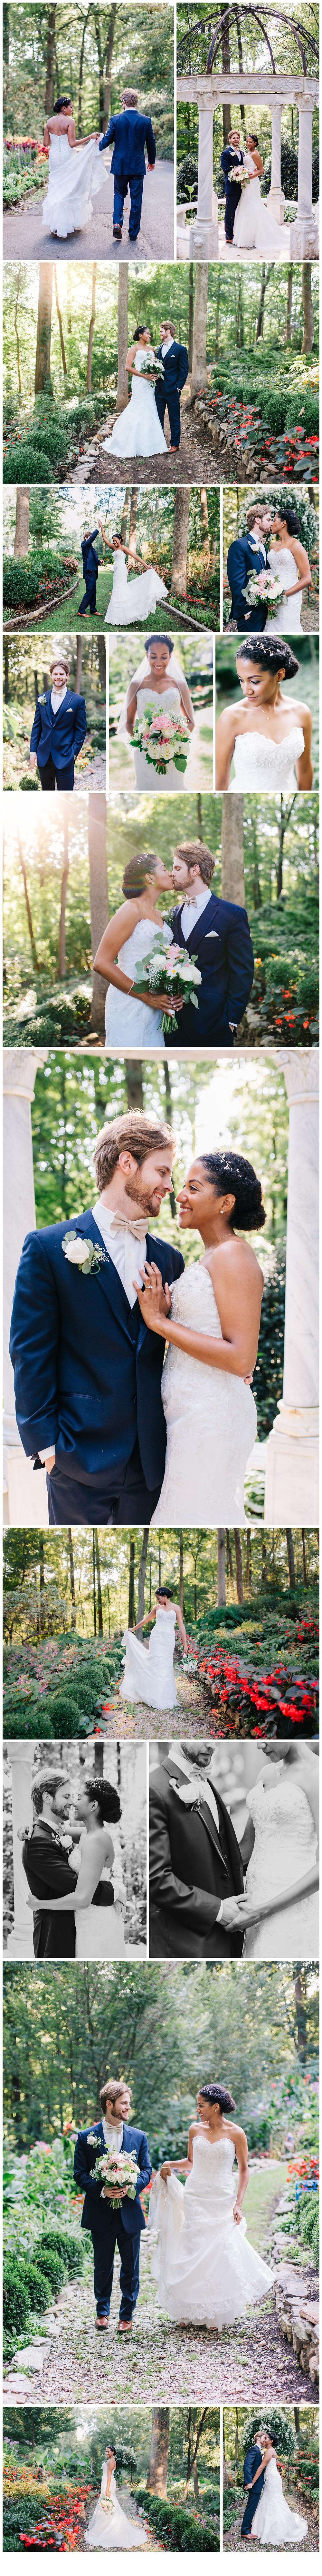 Garden sunset bridal portraits at Gramercy Mansion, Maryland Wedding Photography by Katherine Elizabeth Photography